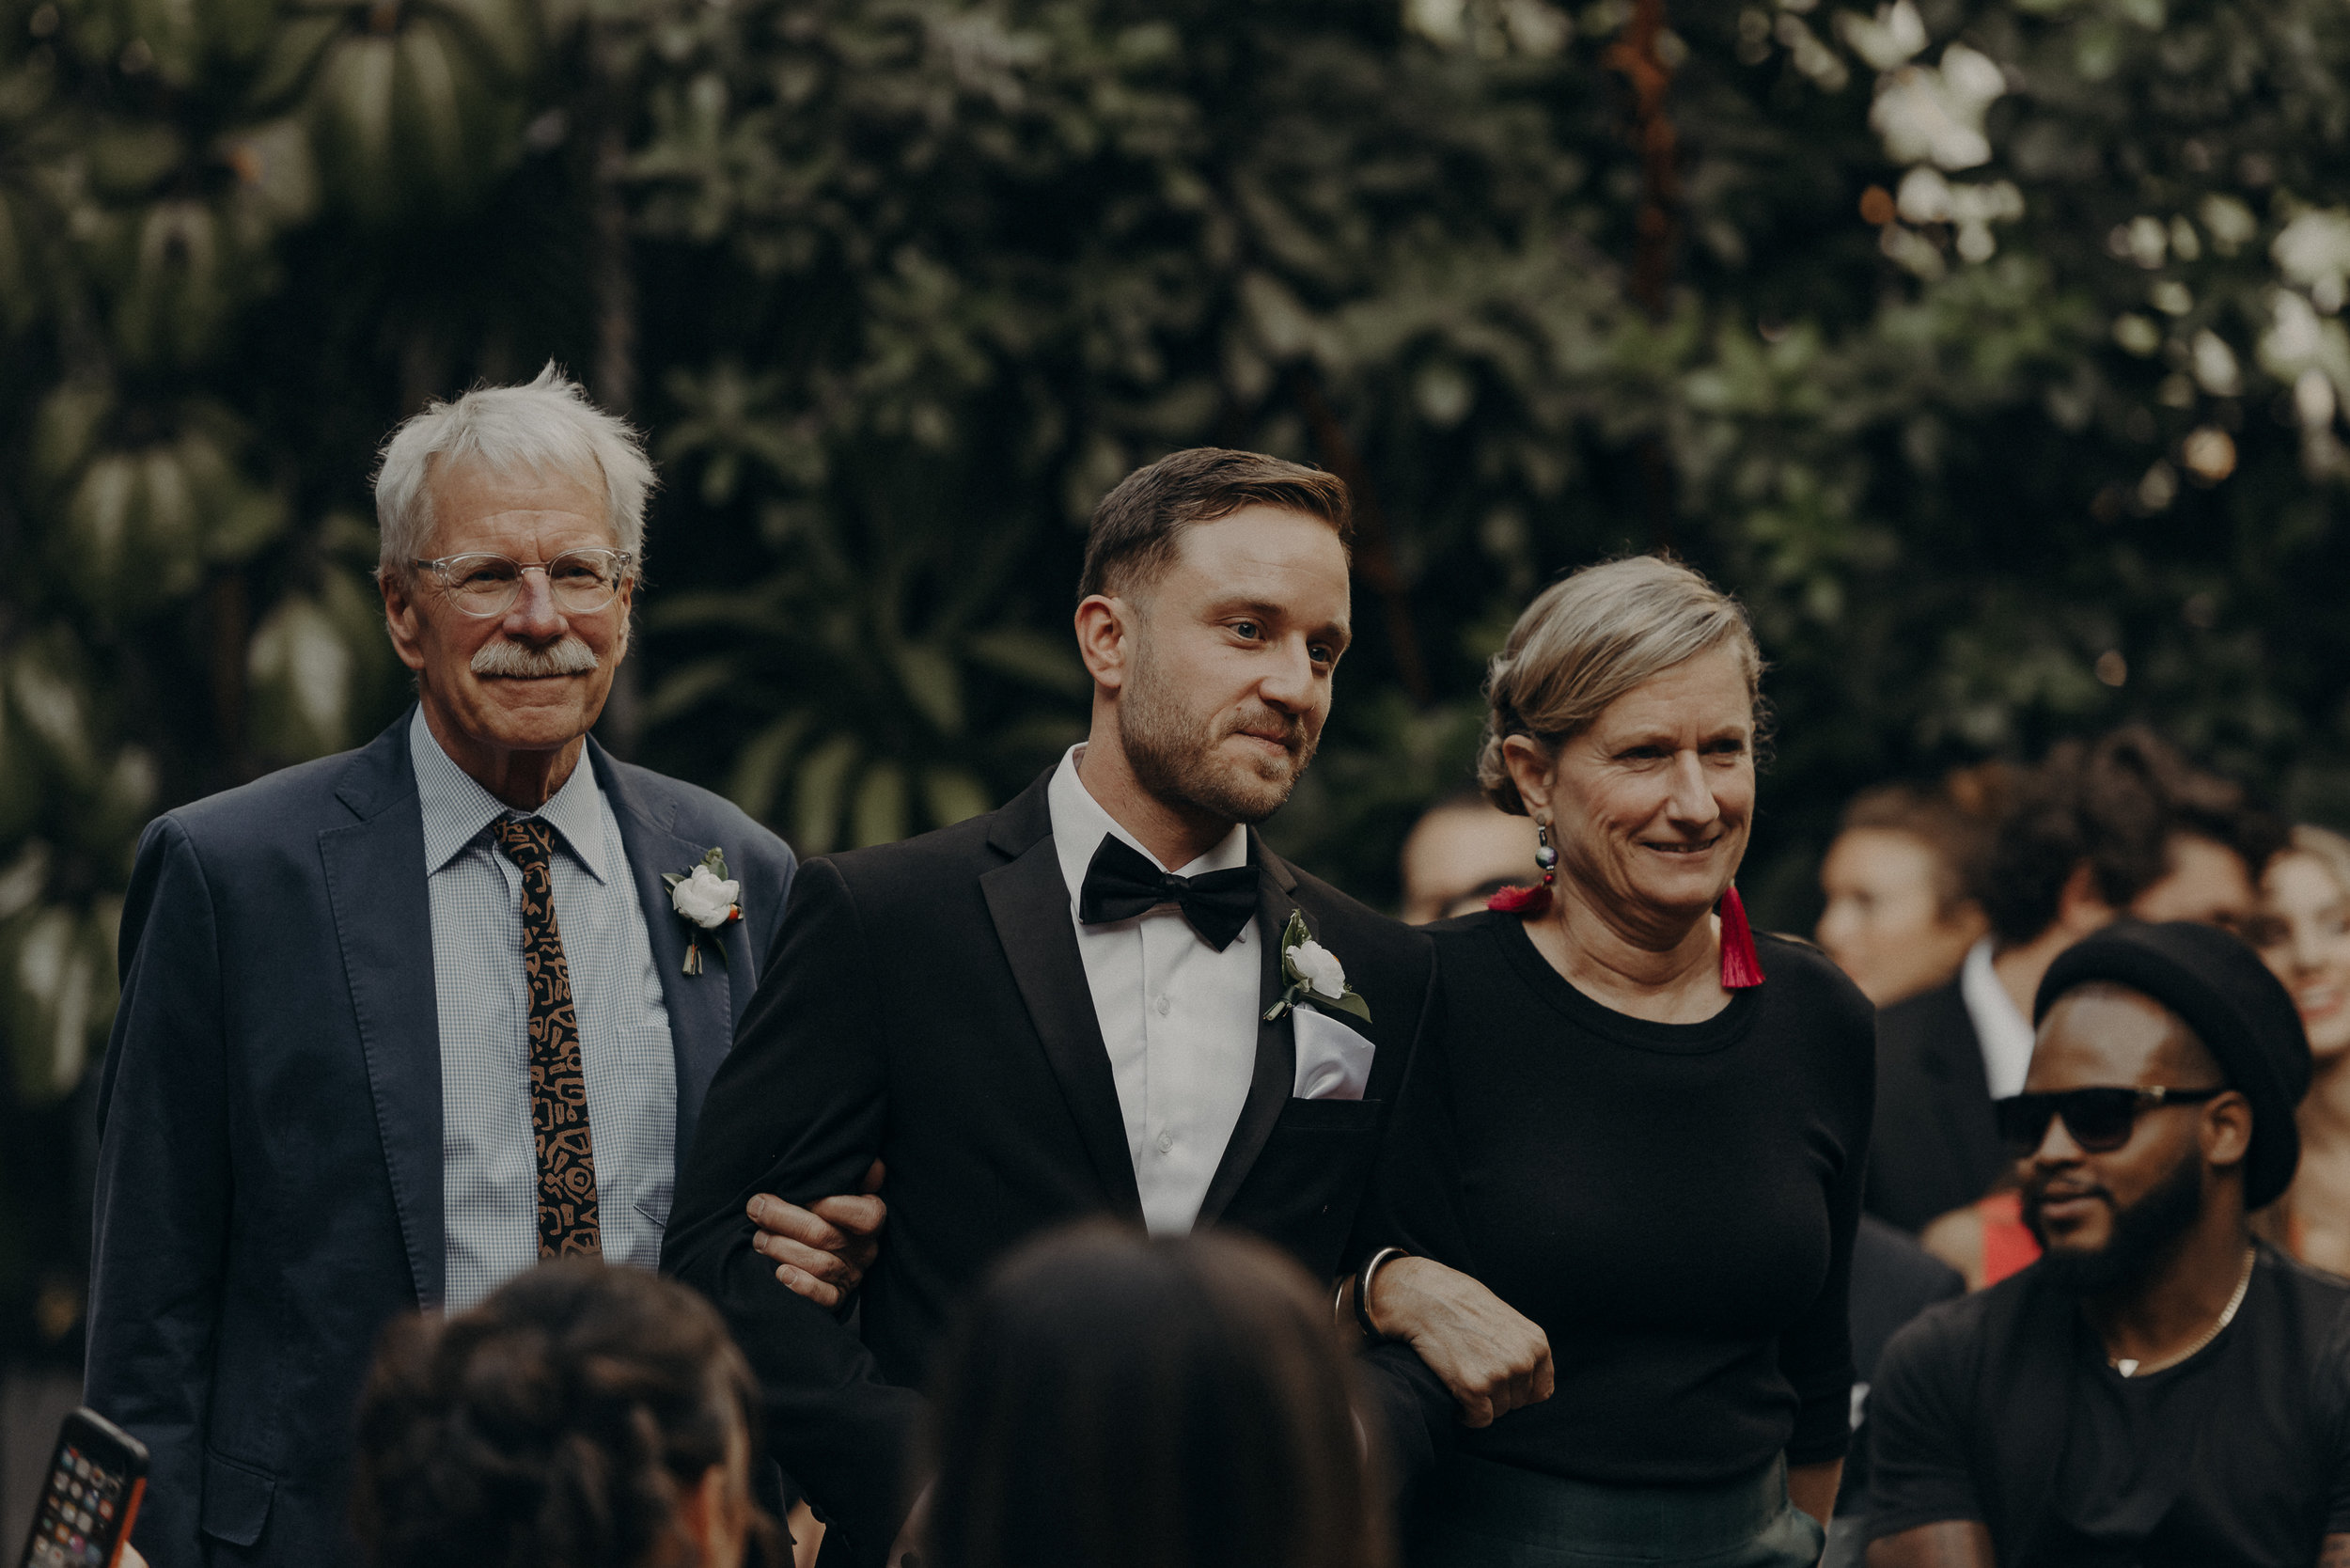 ©Isaiah + Taylor Photography - the Millwick Wedding, Long Beach Wedding Photographer-088.jpg